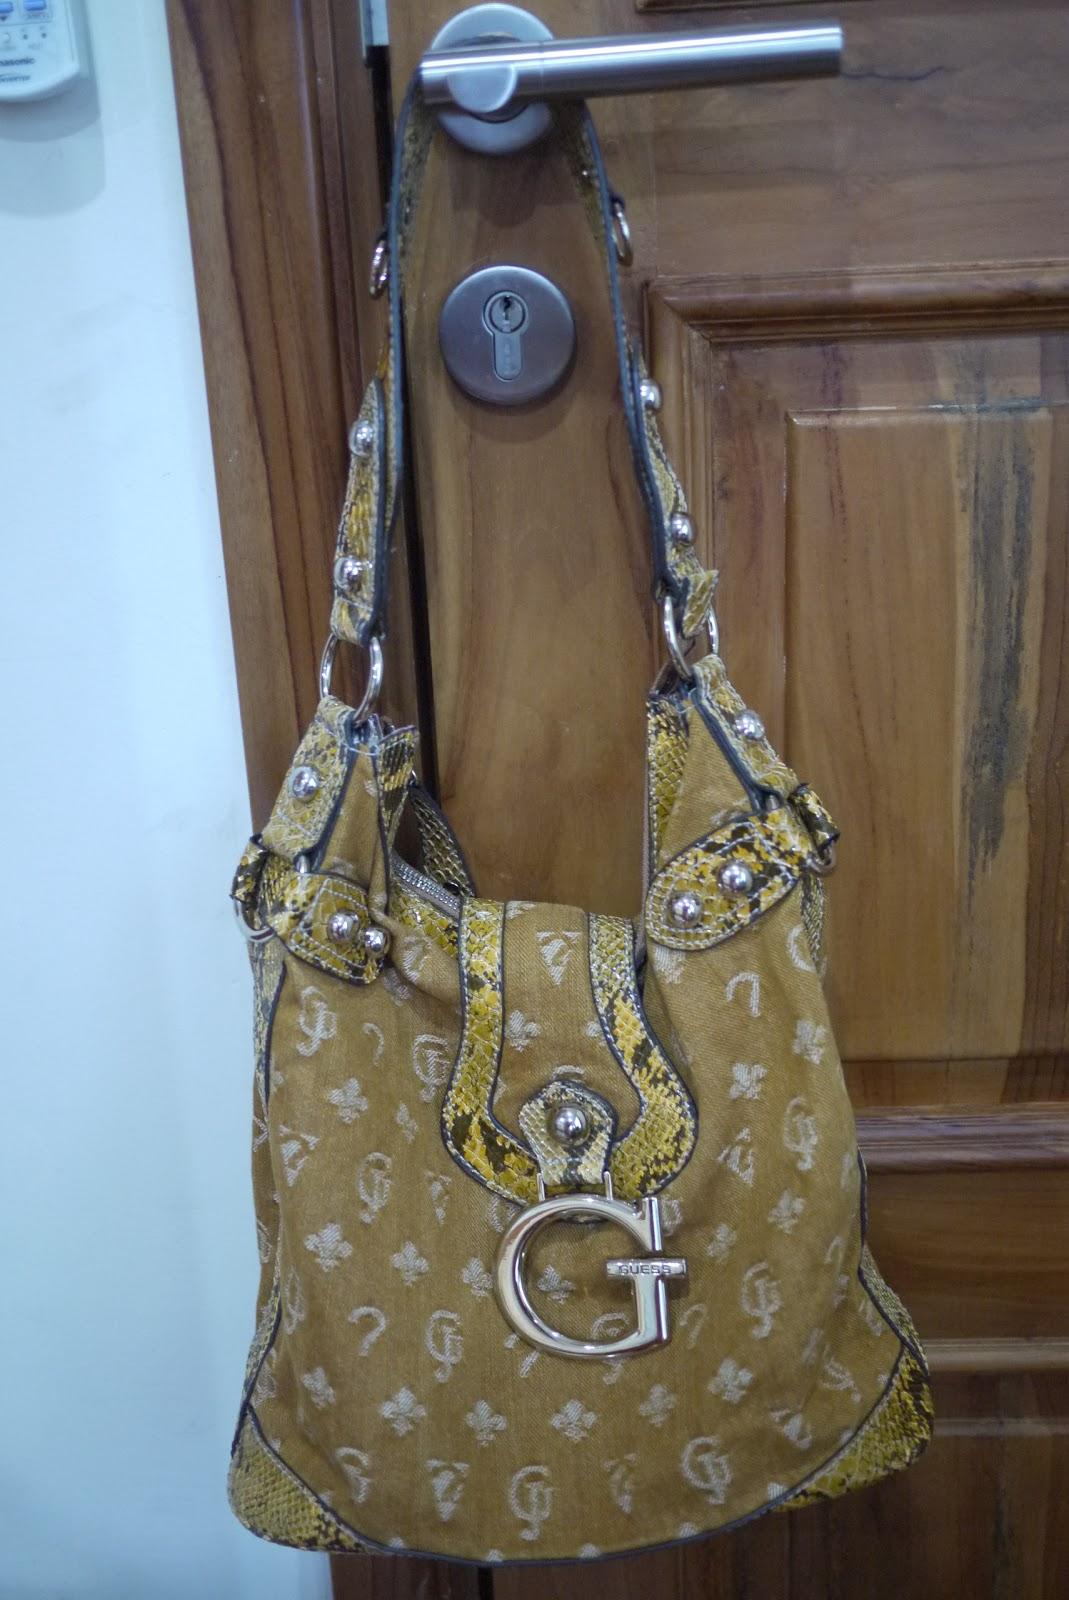 Preloved Orange Guess Handbag Adorable Muslimah S Preloved